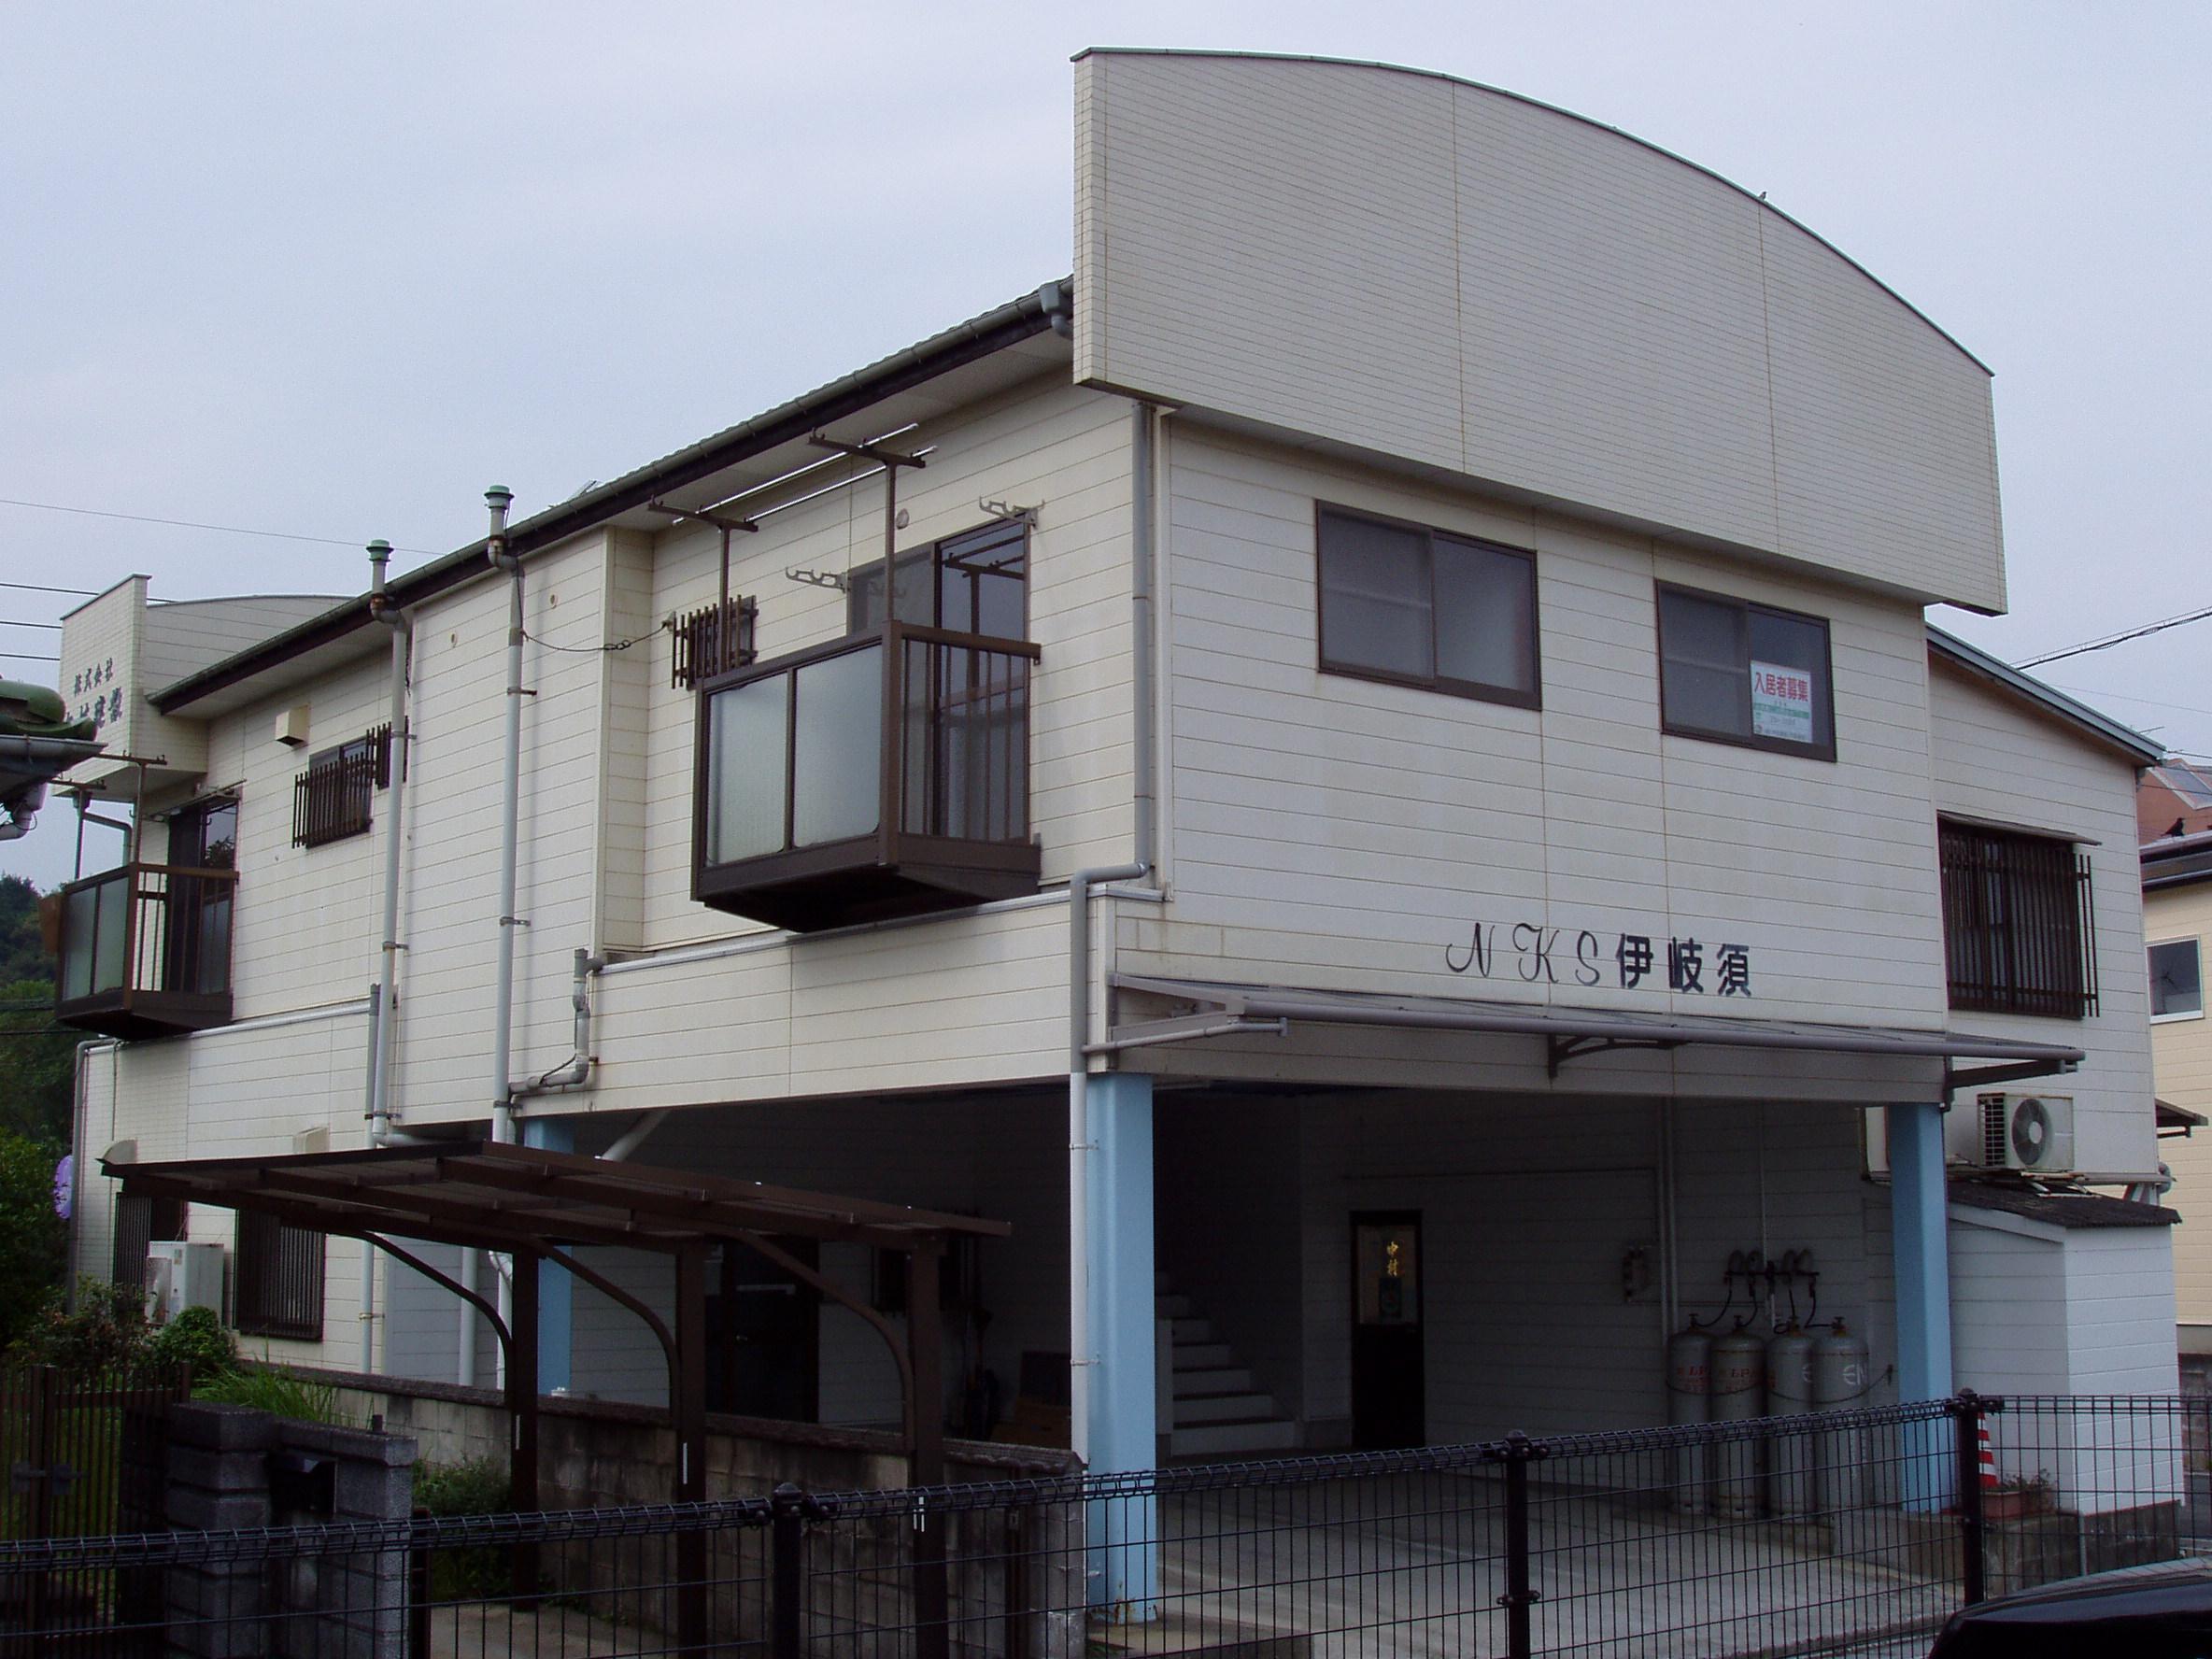 NKS伊岐須